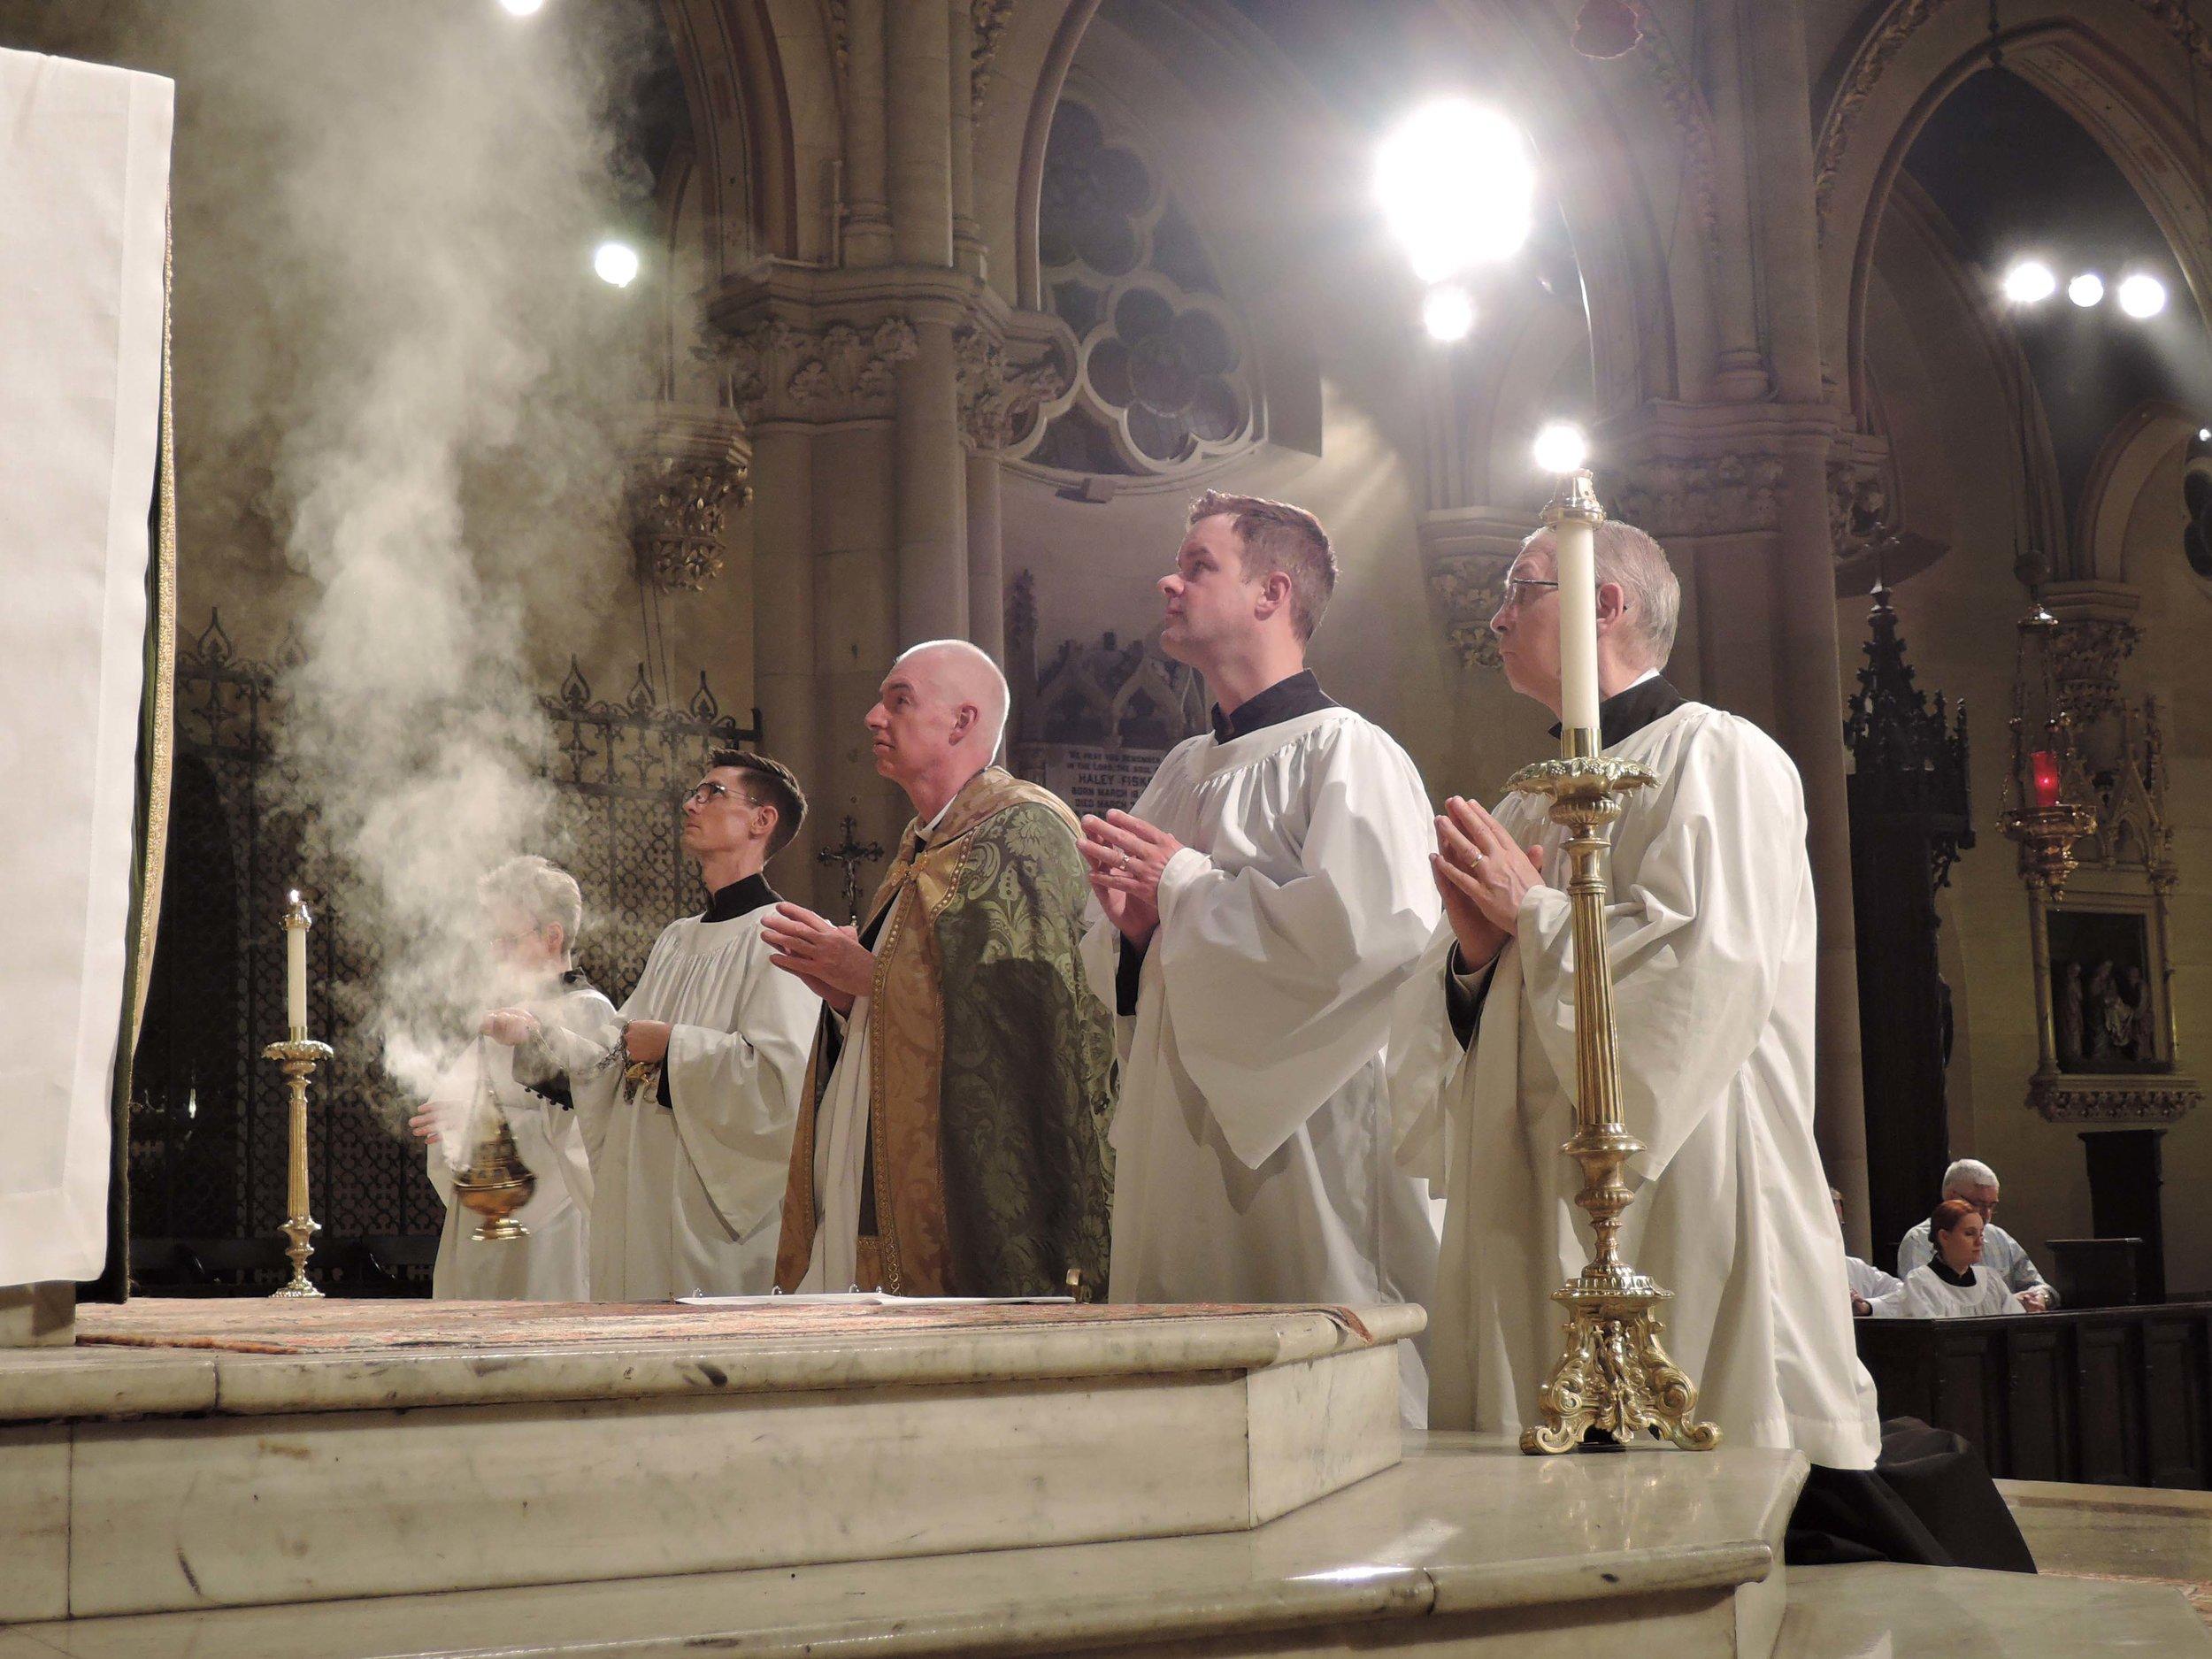 At Eucharistic Benediction on Sunday, October 1